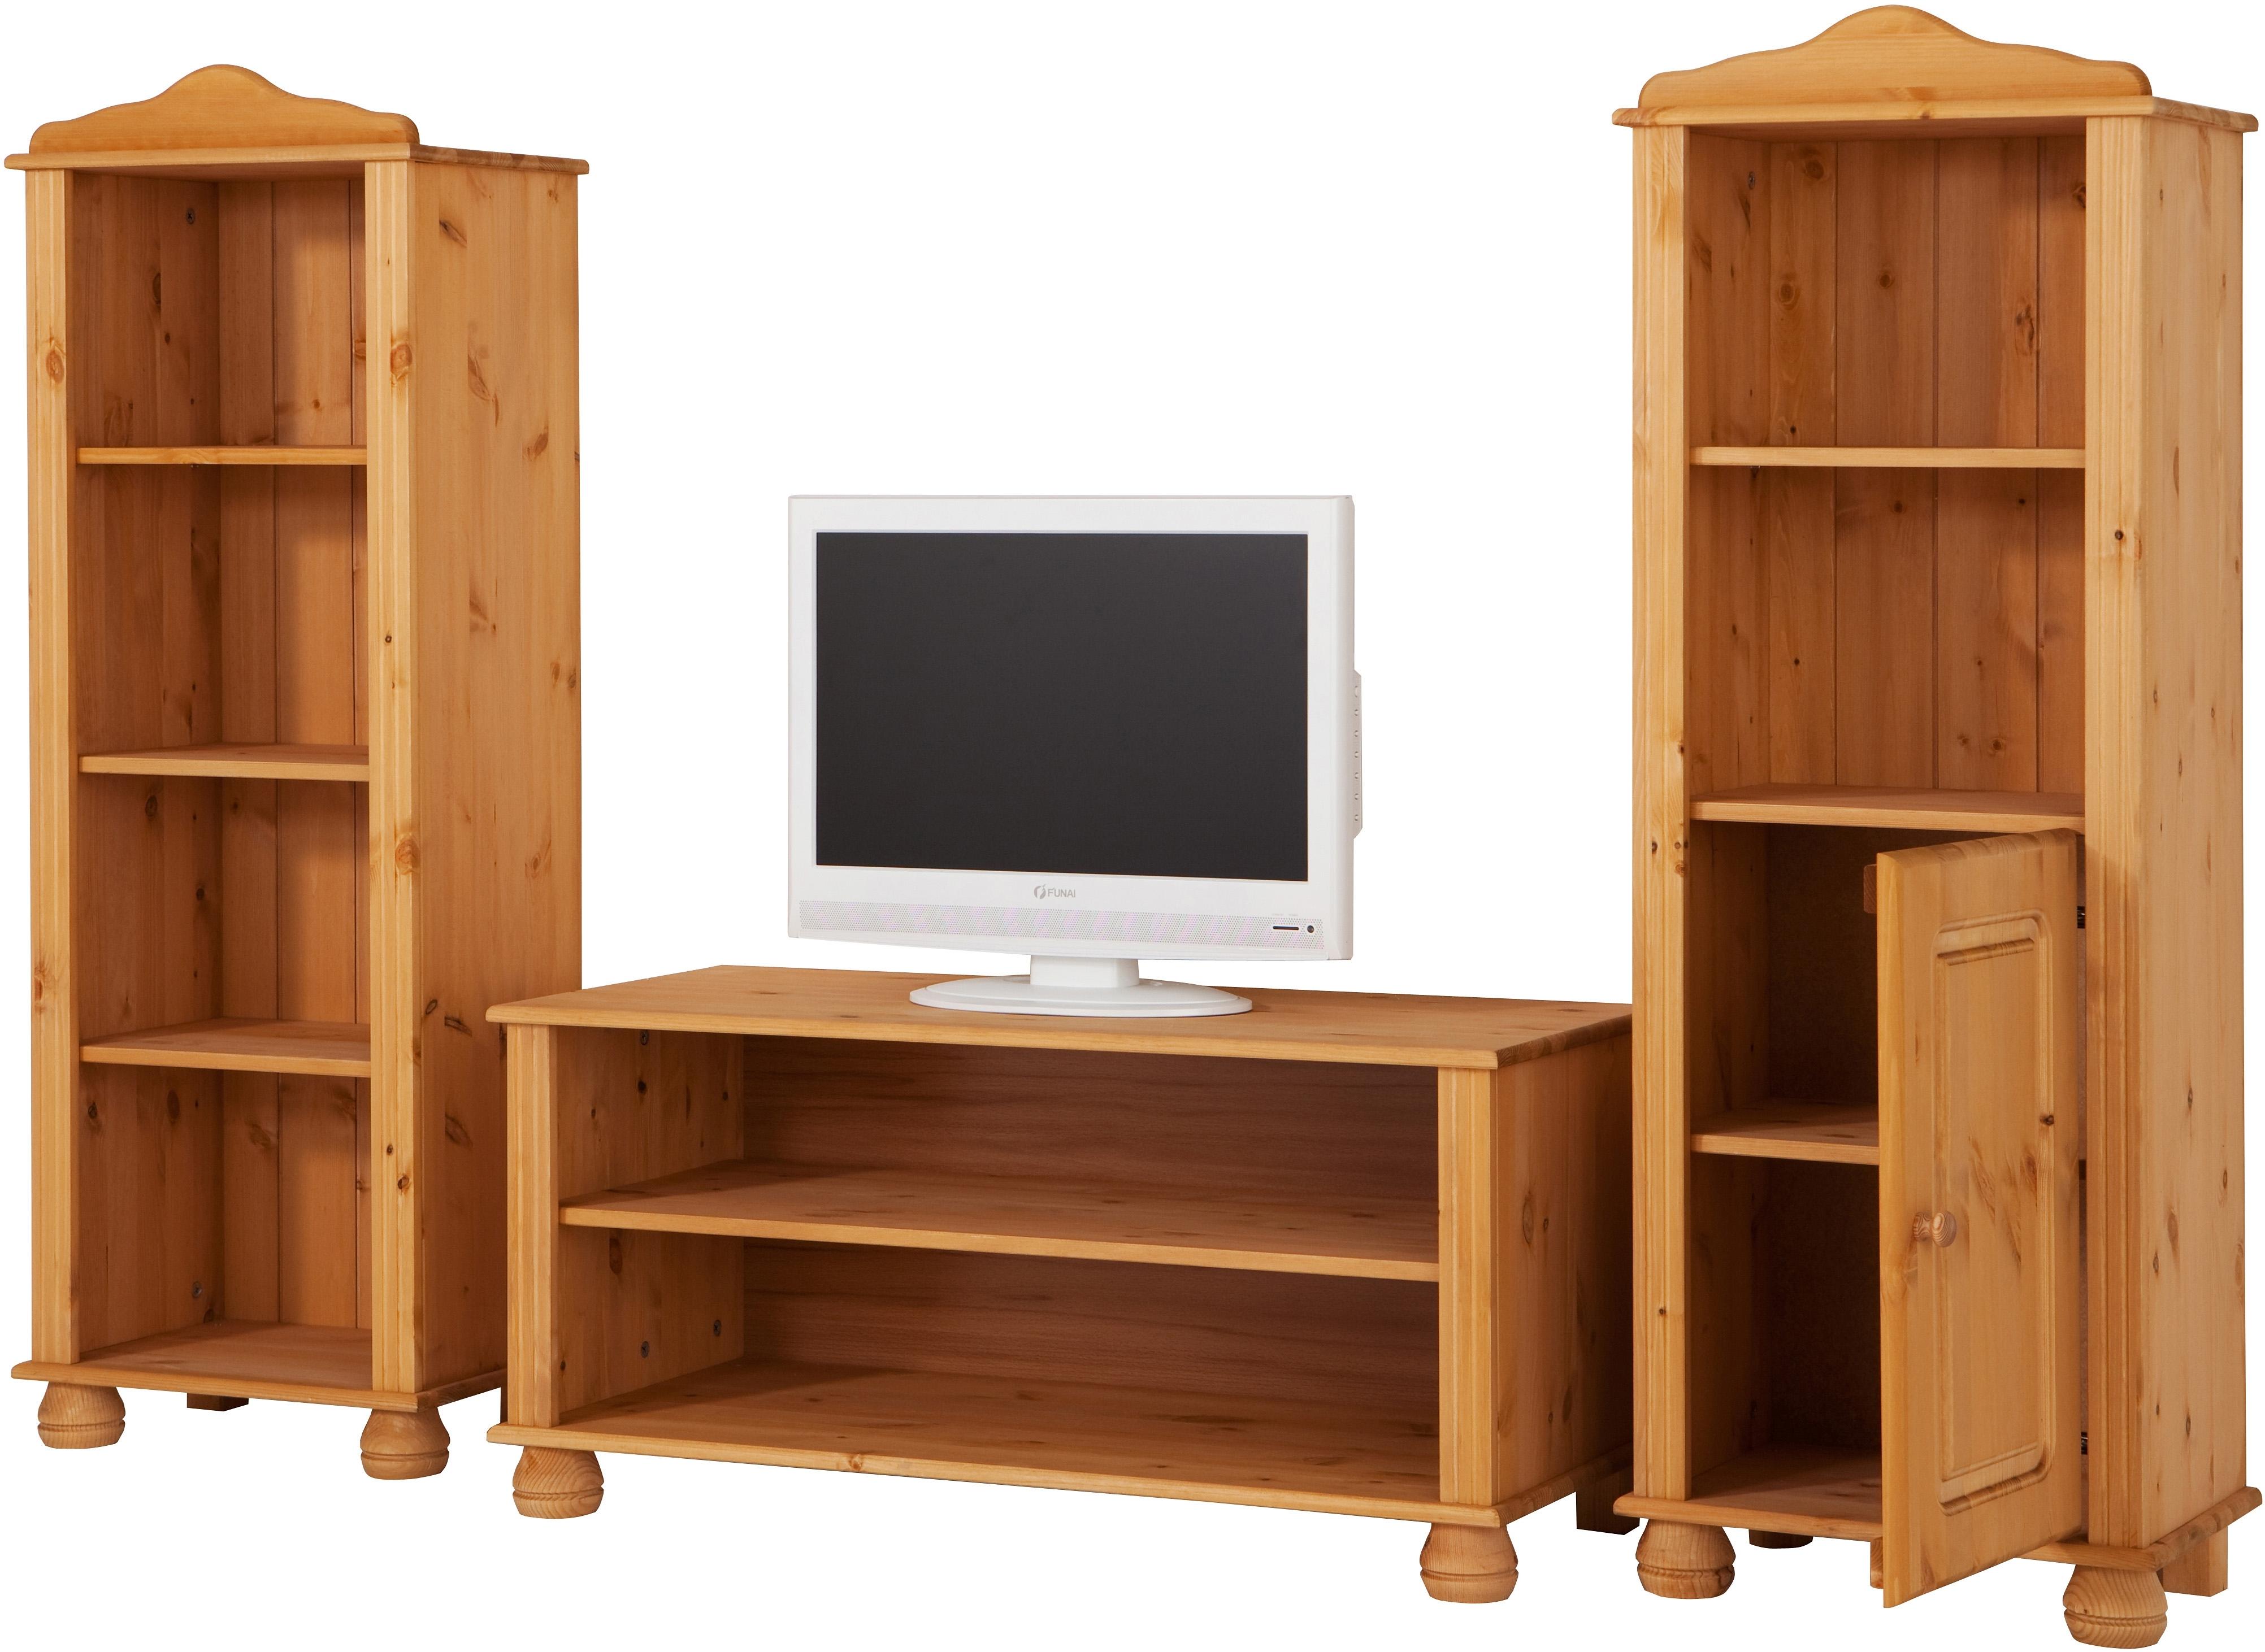 home affaire 3 delig wandmeubel in landhuisstijl online bij otto. Black Bedroom Furniture Sets. Home Design Ideas